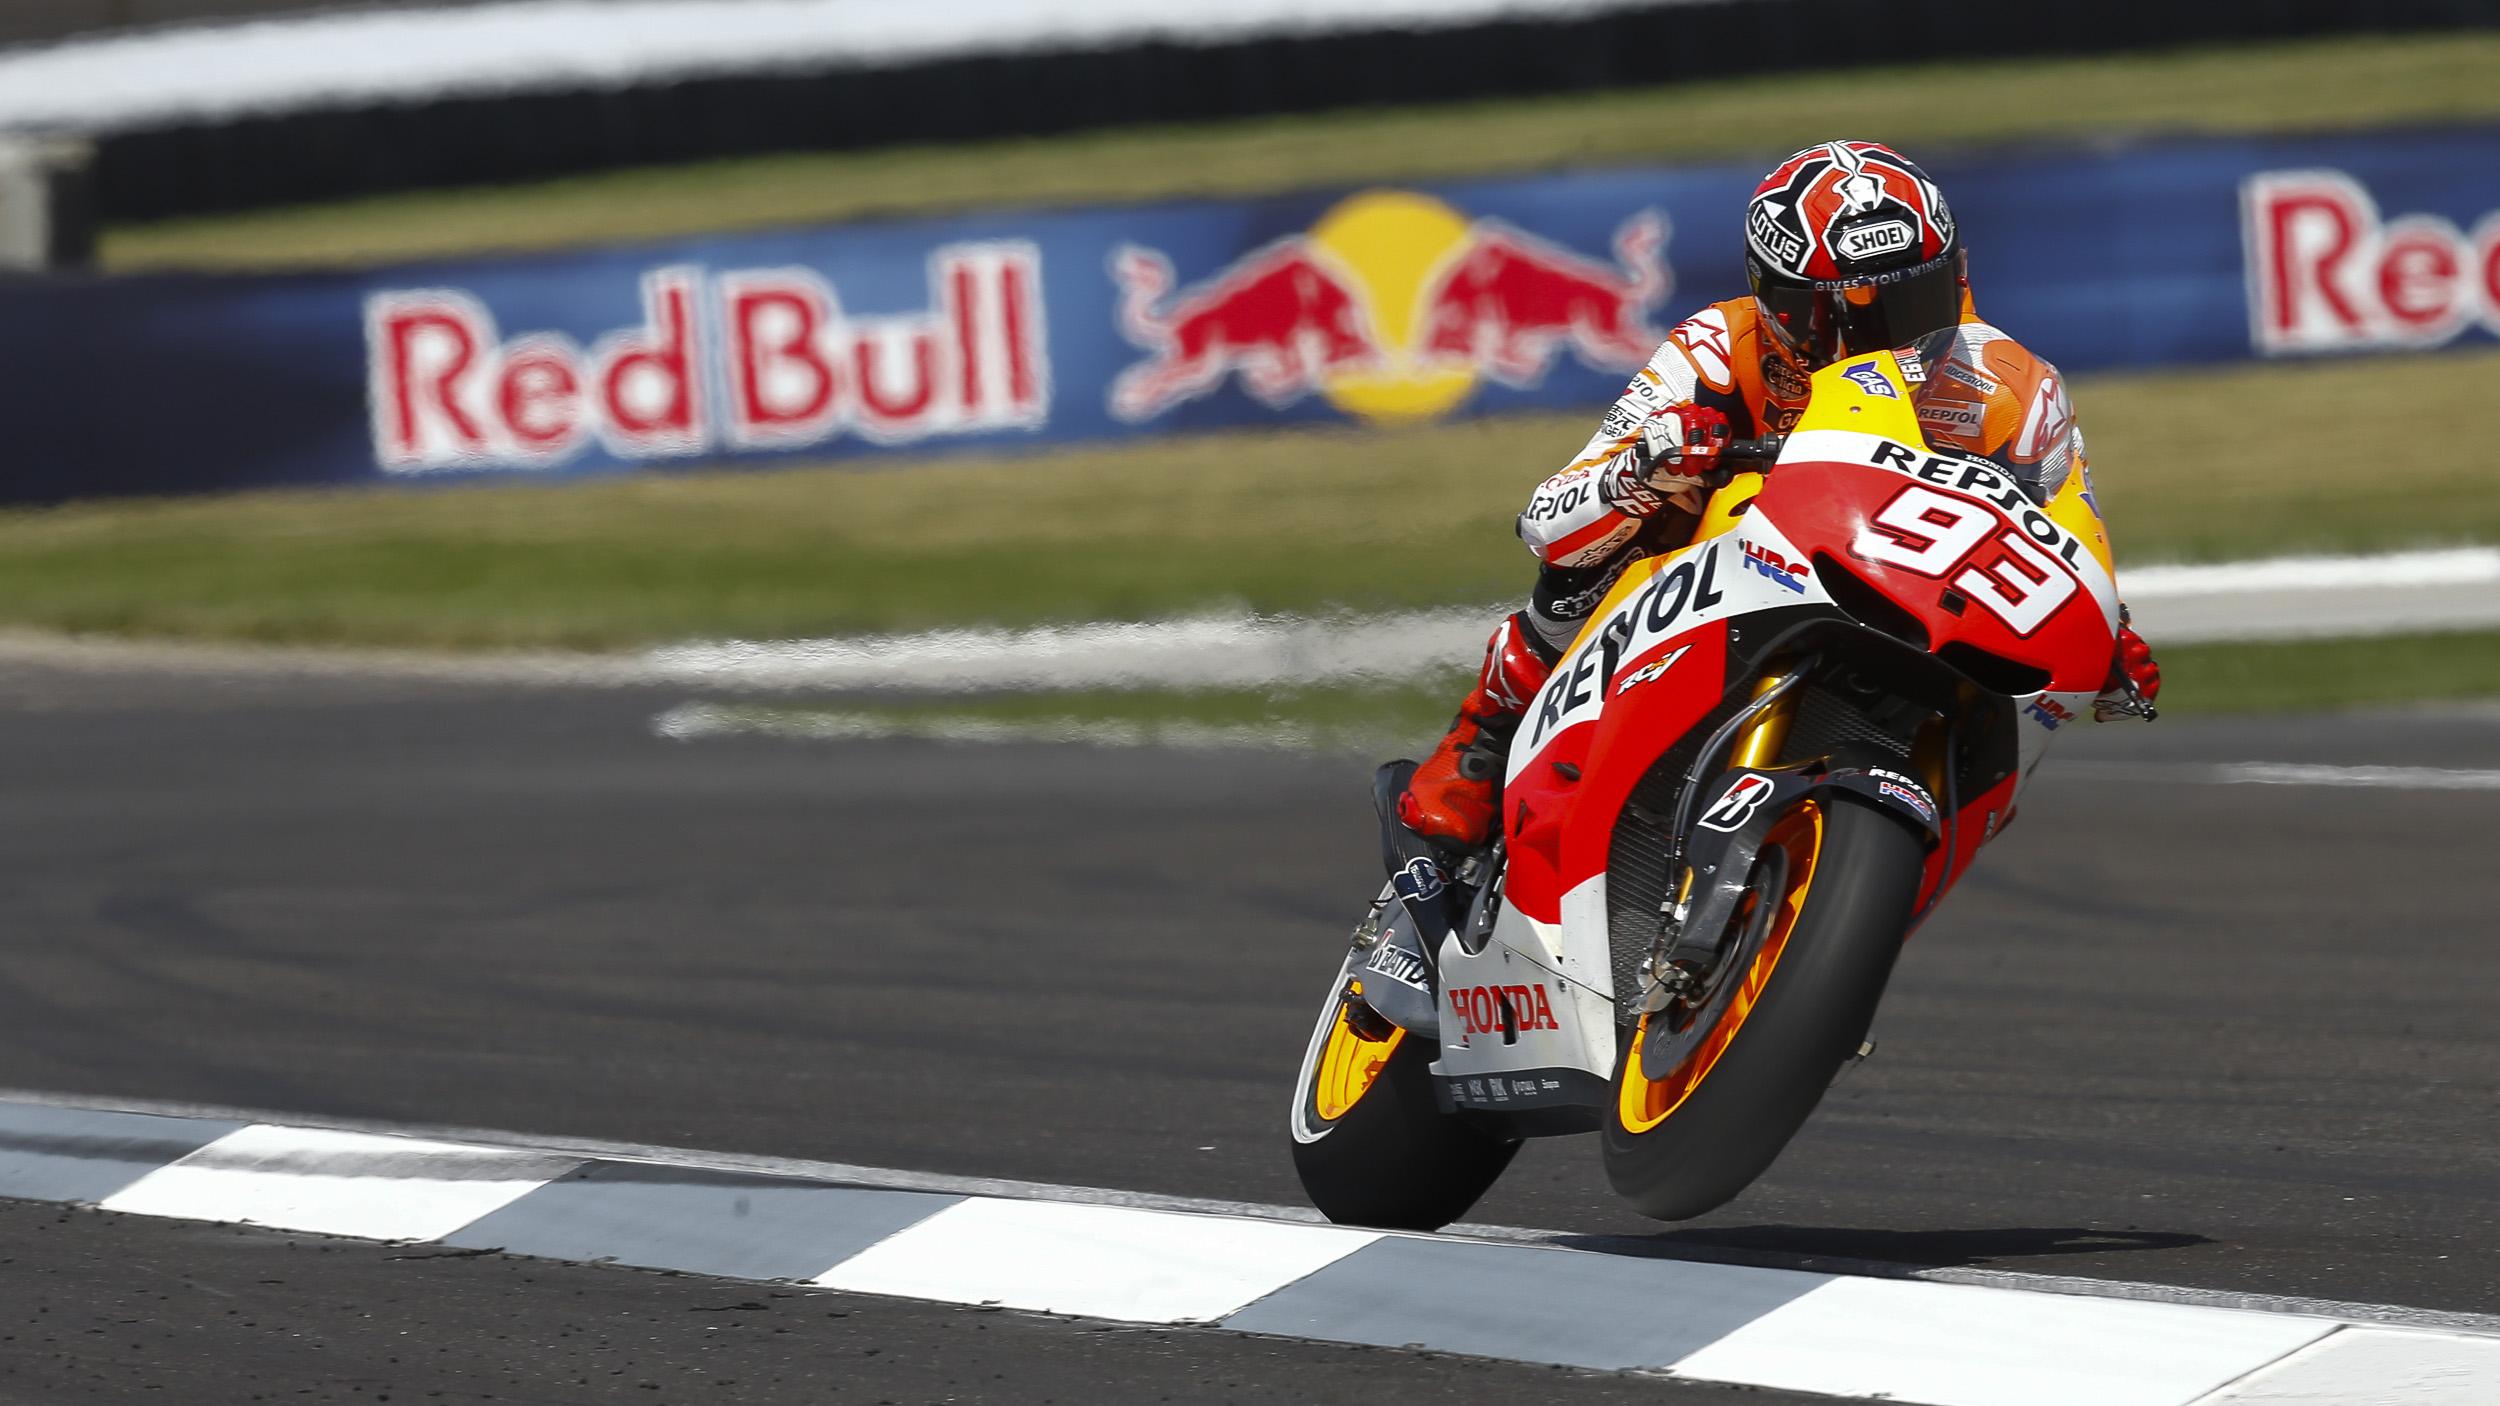 Cool Marc Marquez In MotoGP HD Wallpaper Wallpaper with 2500x1406 2500x1406